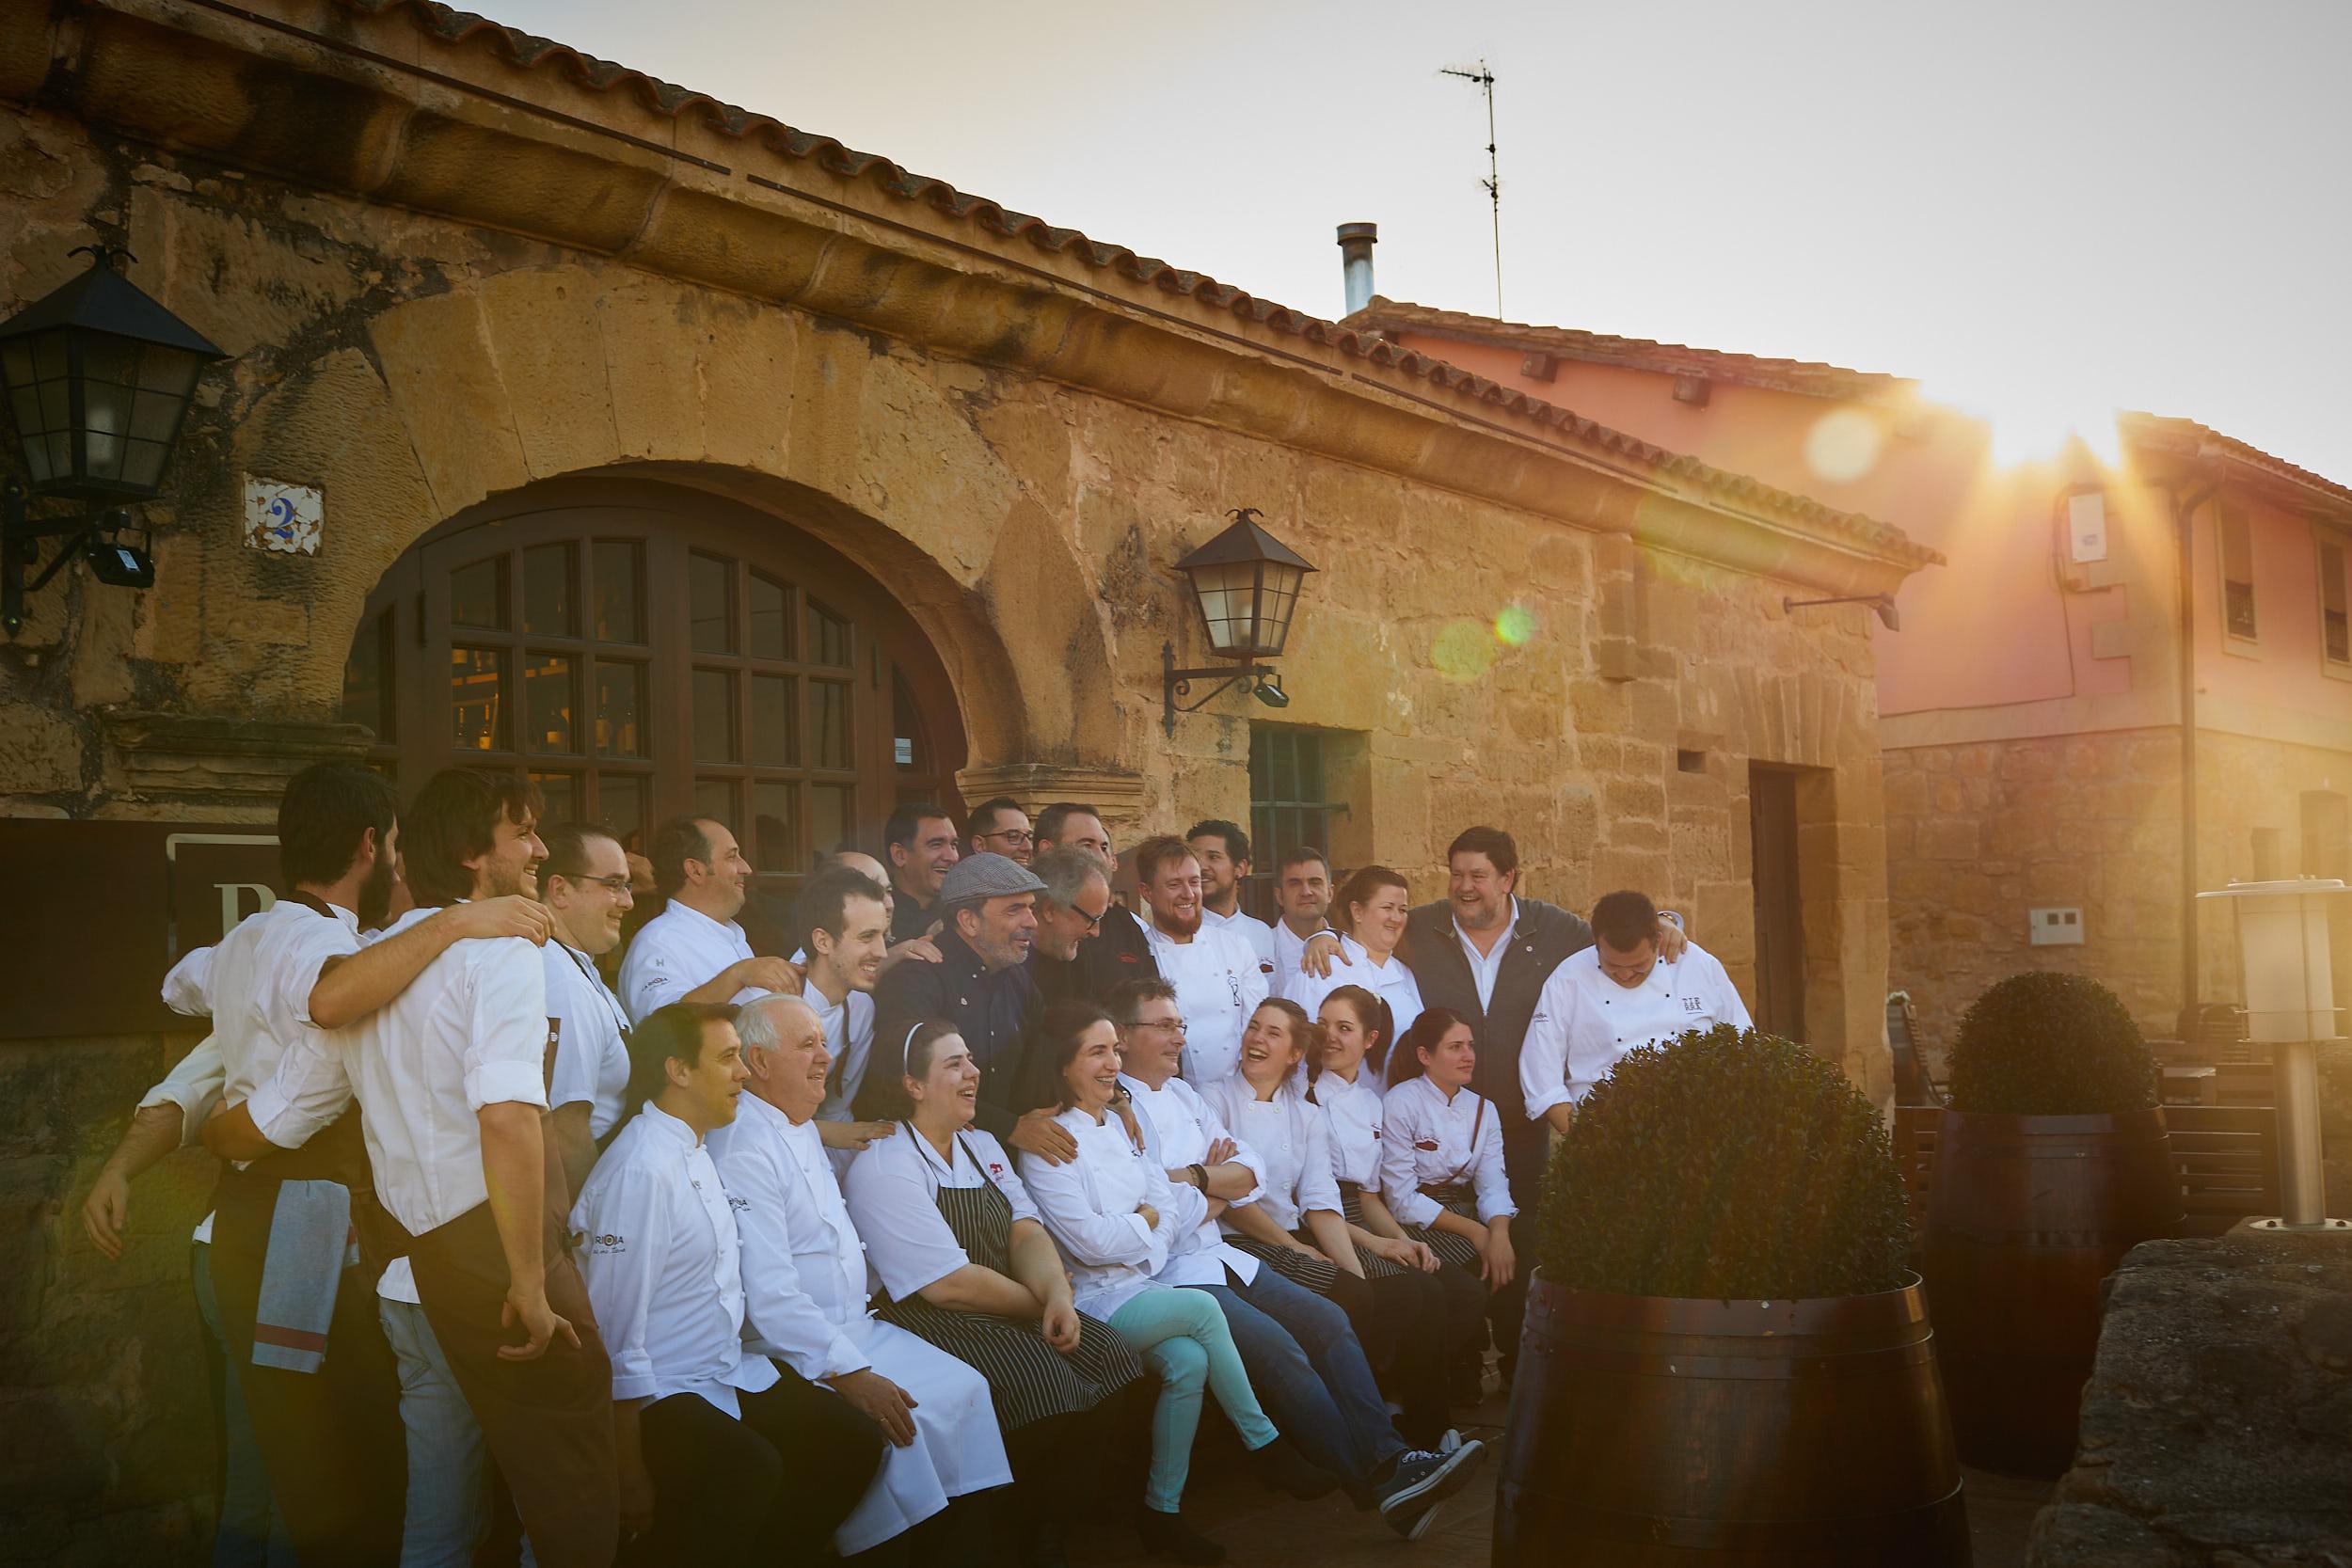 1903Restaurante_La_Vieja_Bodega_Casalarreina_La_Rioja_Spain_Sturcke_0015.jpg